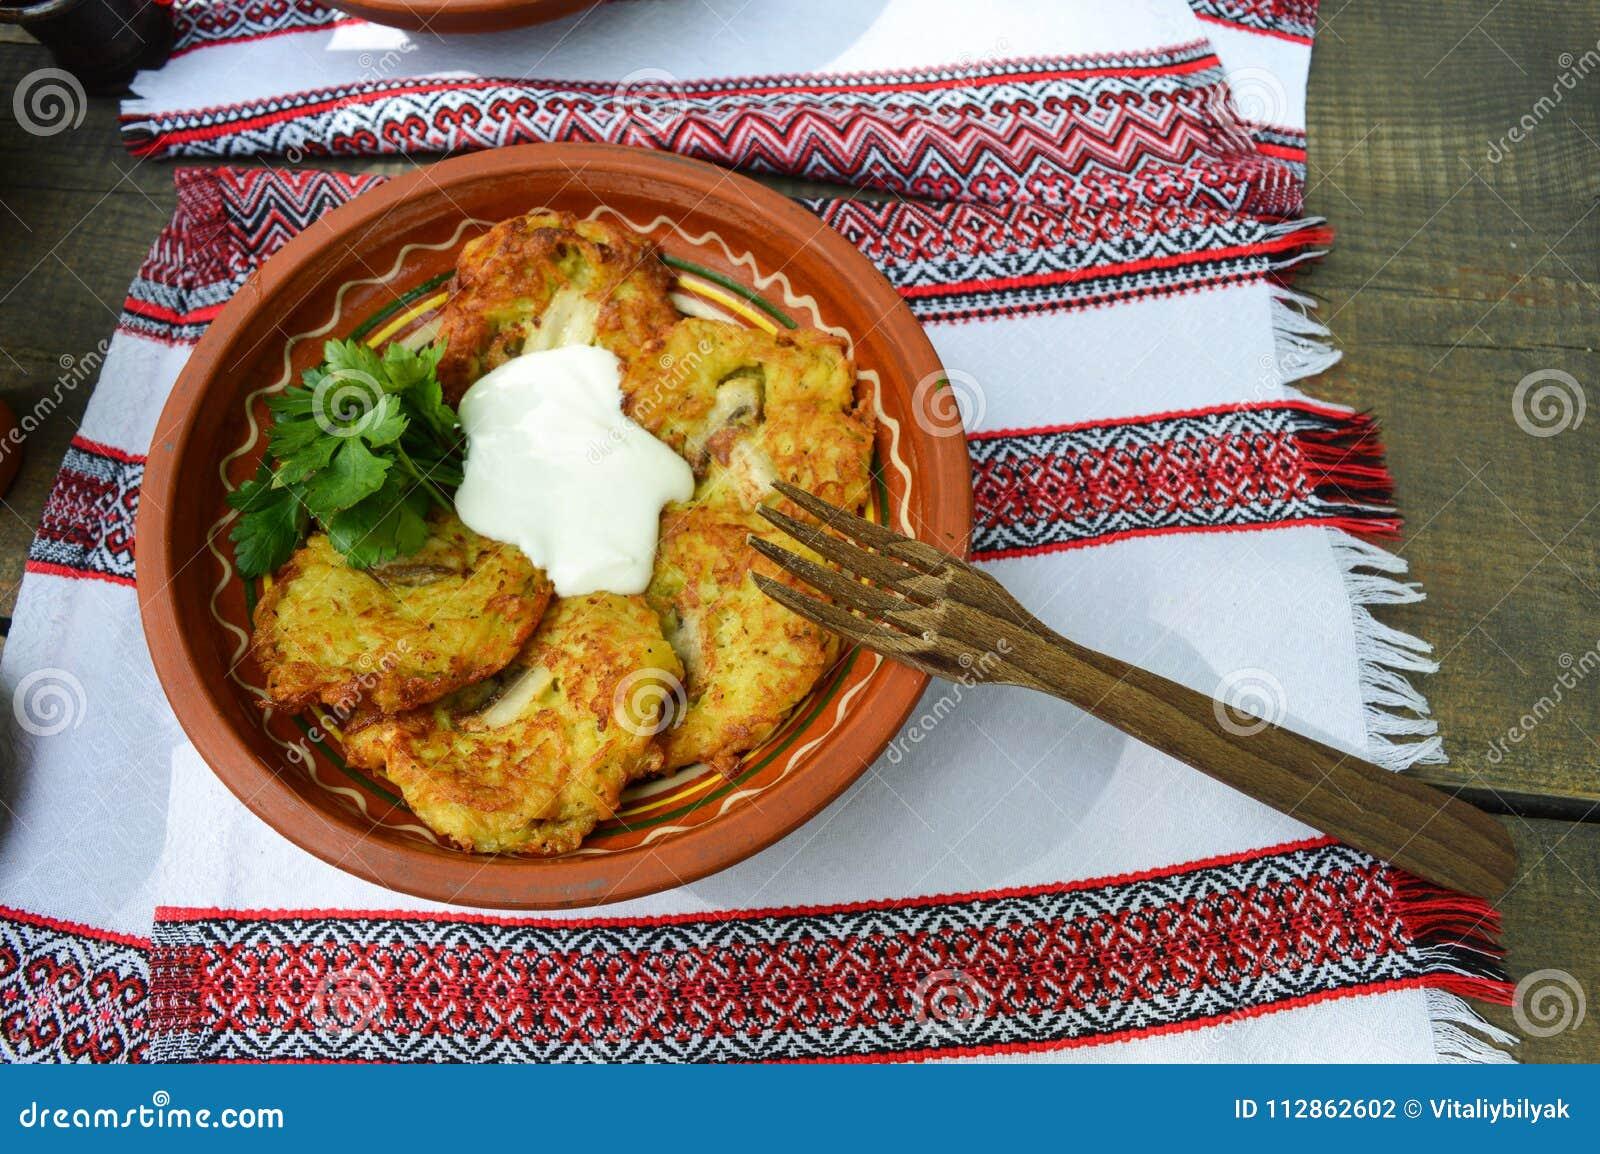 Ukrainian cuisine: a selection of sites